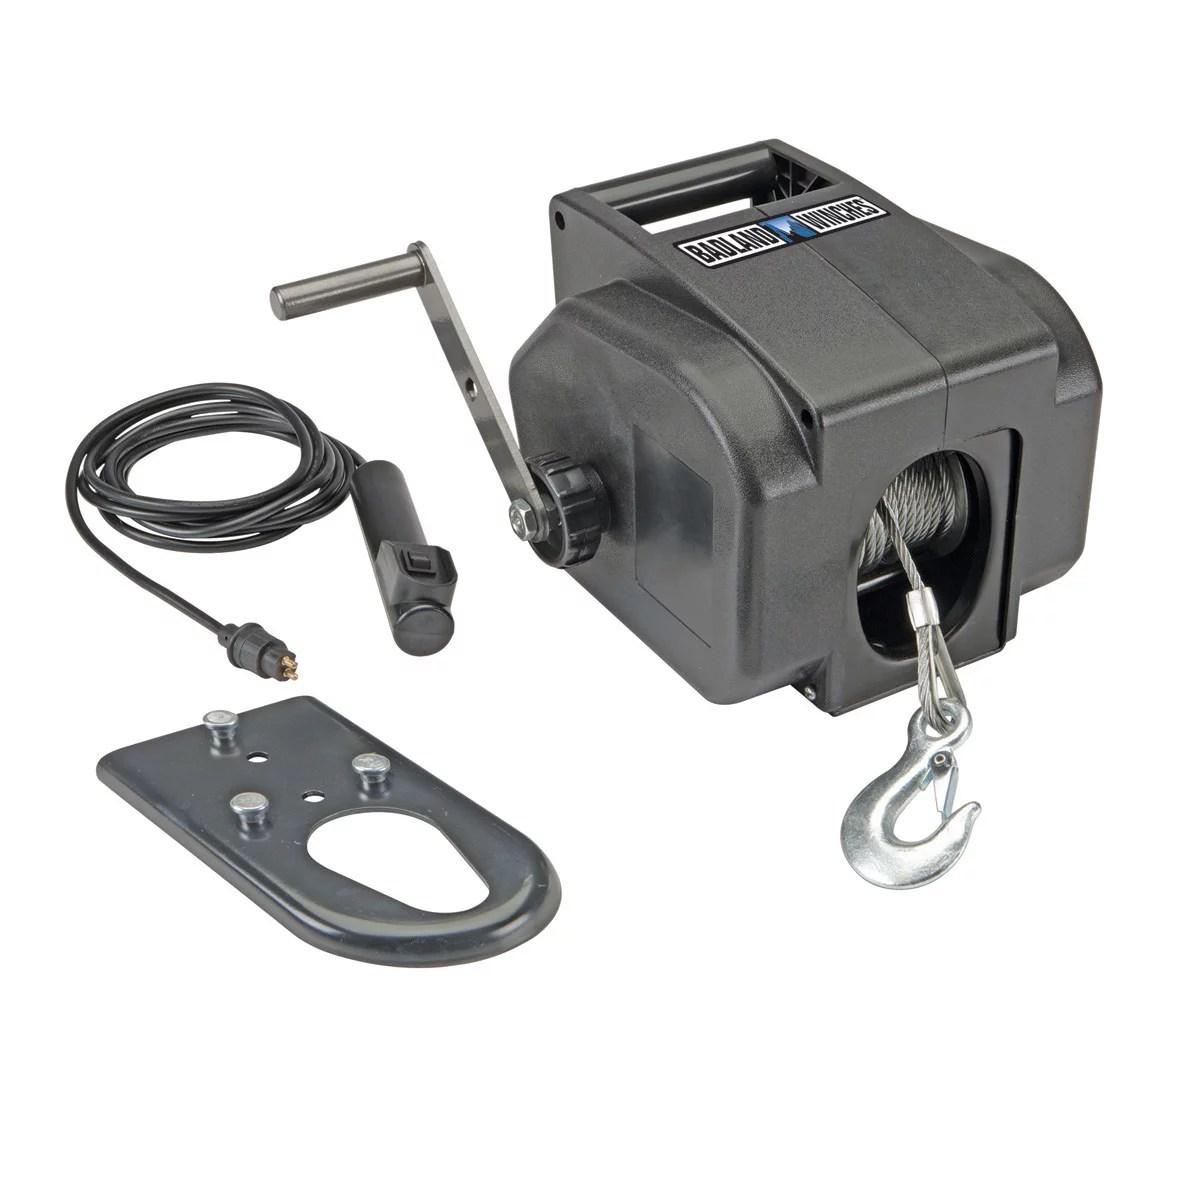 medium resolution of badland marine electric winch 2000 lb towing cable 30 ft aircraft badlands 2000 lb winch wiring diagram badlands 2000 lb winch wiring